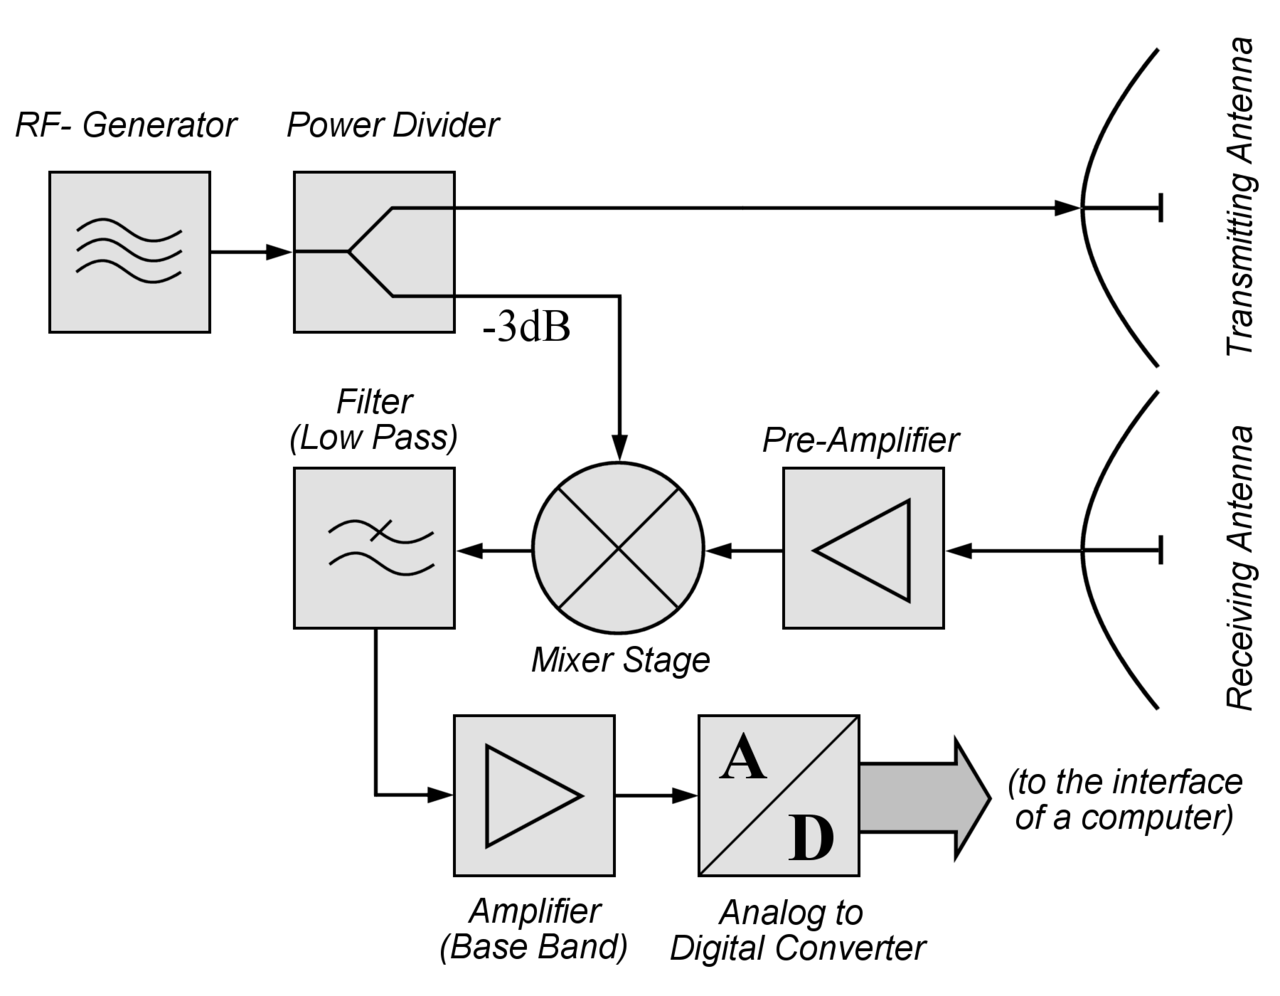 fmcw radar block diagram yamaha atv starter relay wiring file bsp2 cw en png wikimedia commons